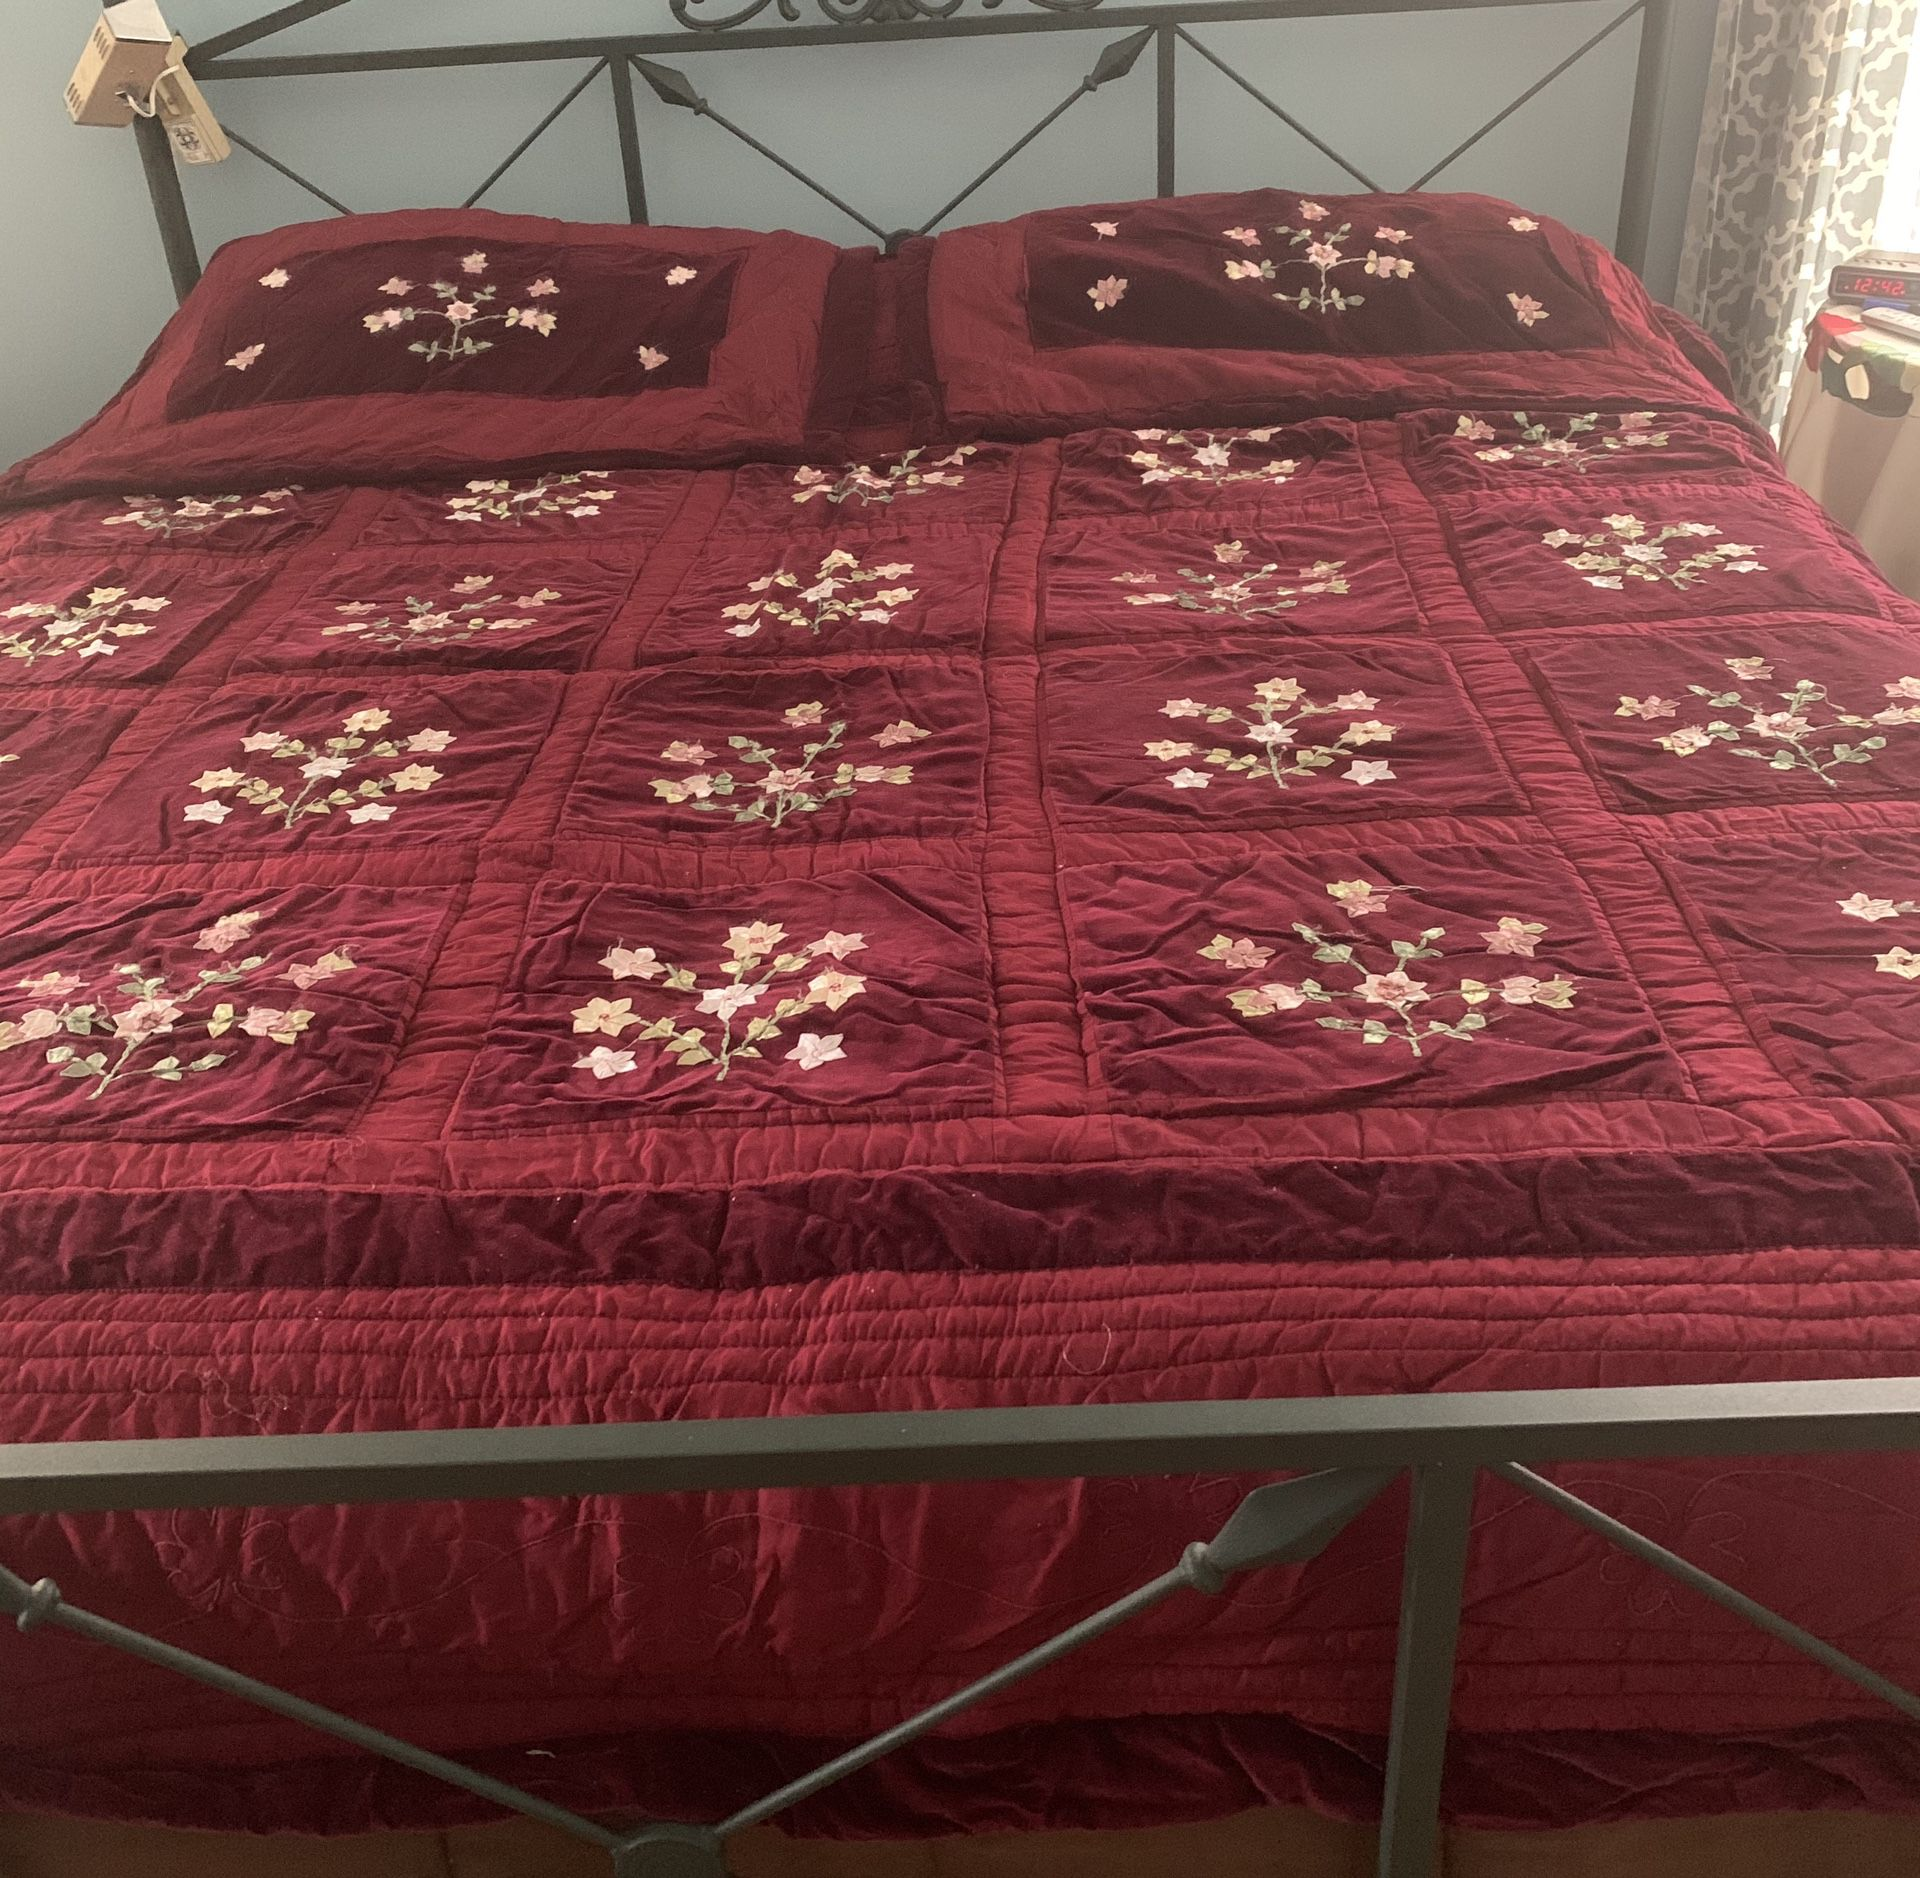 King size luxury bed ensemble